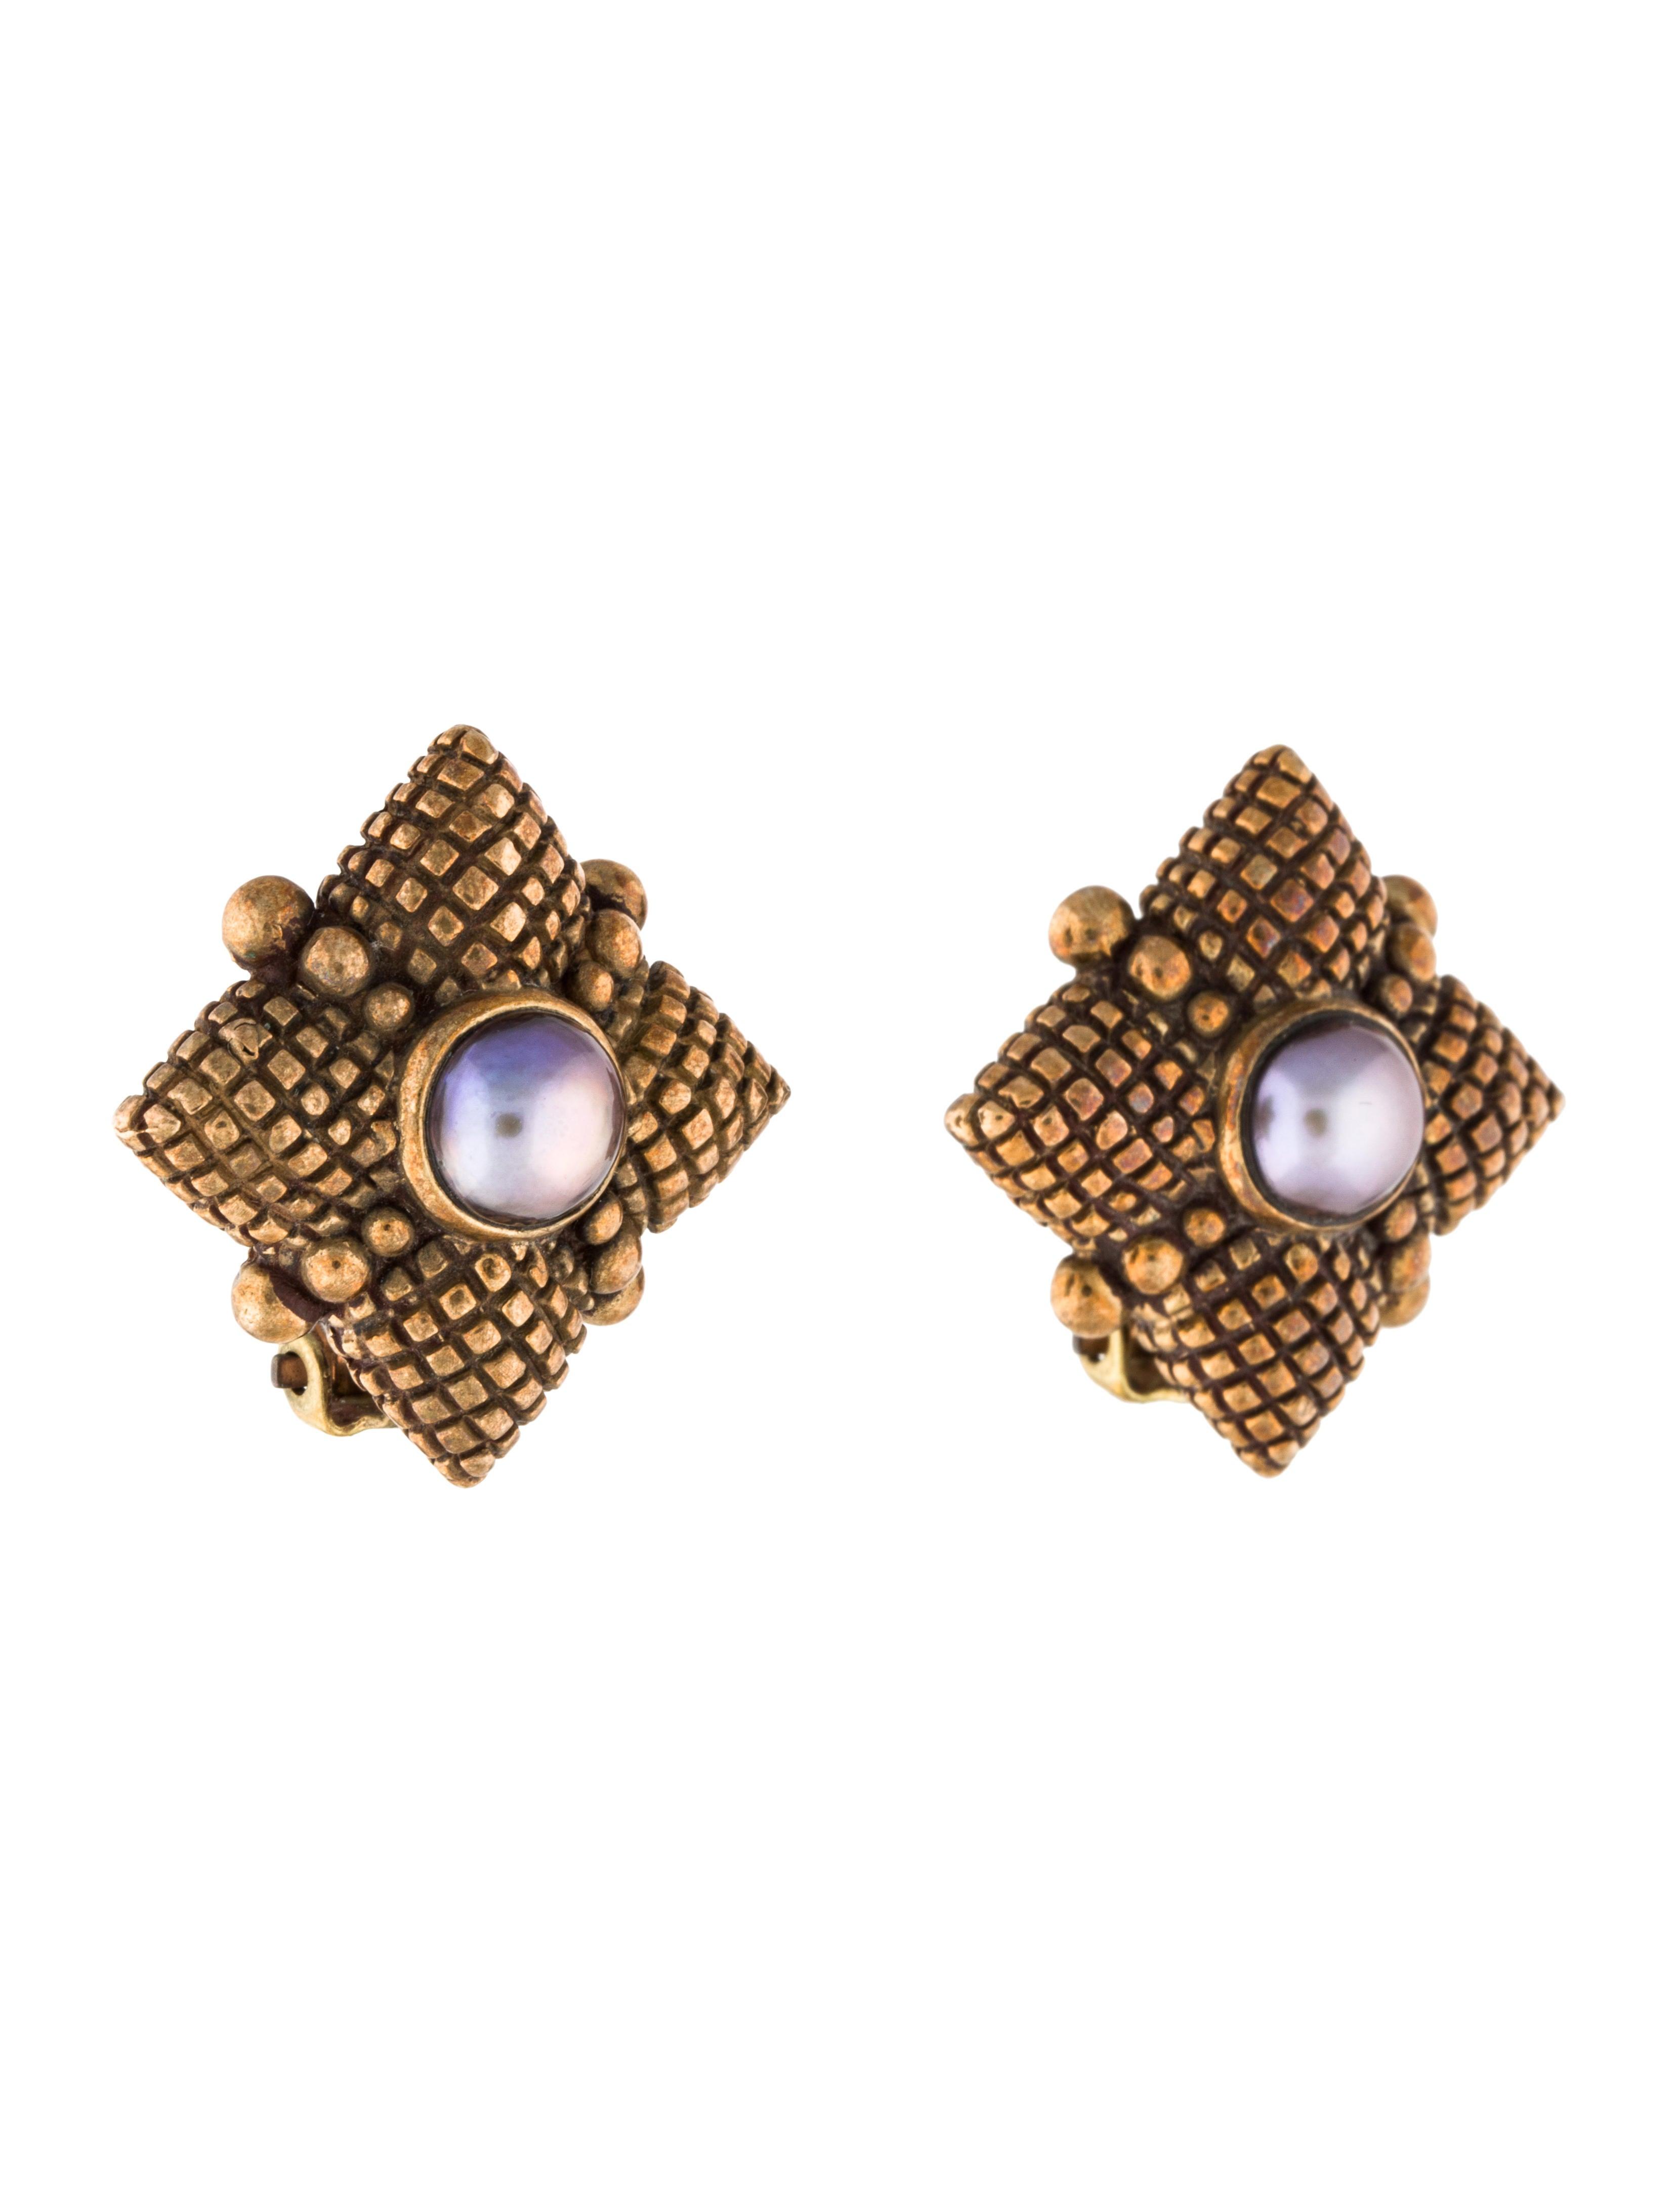 stephen dweck pearl clip on earrings earrings std22004. Black Bedroom Furniture Sets. Home Design Ideas